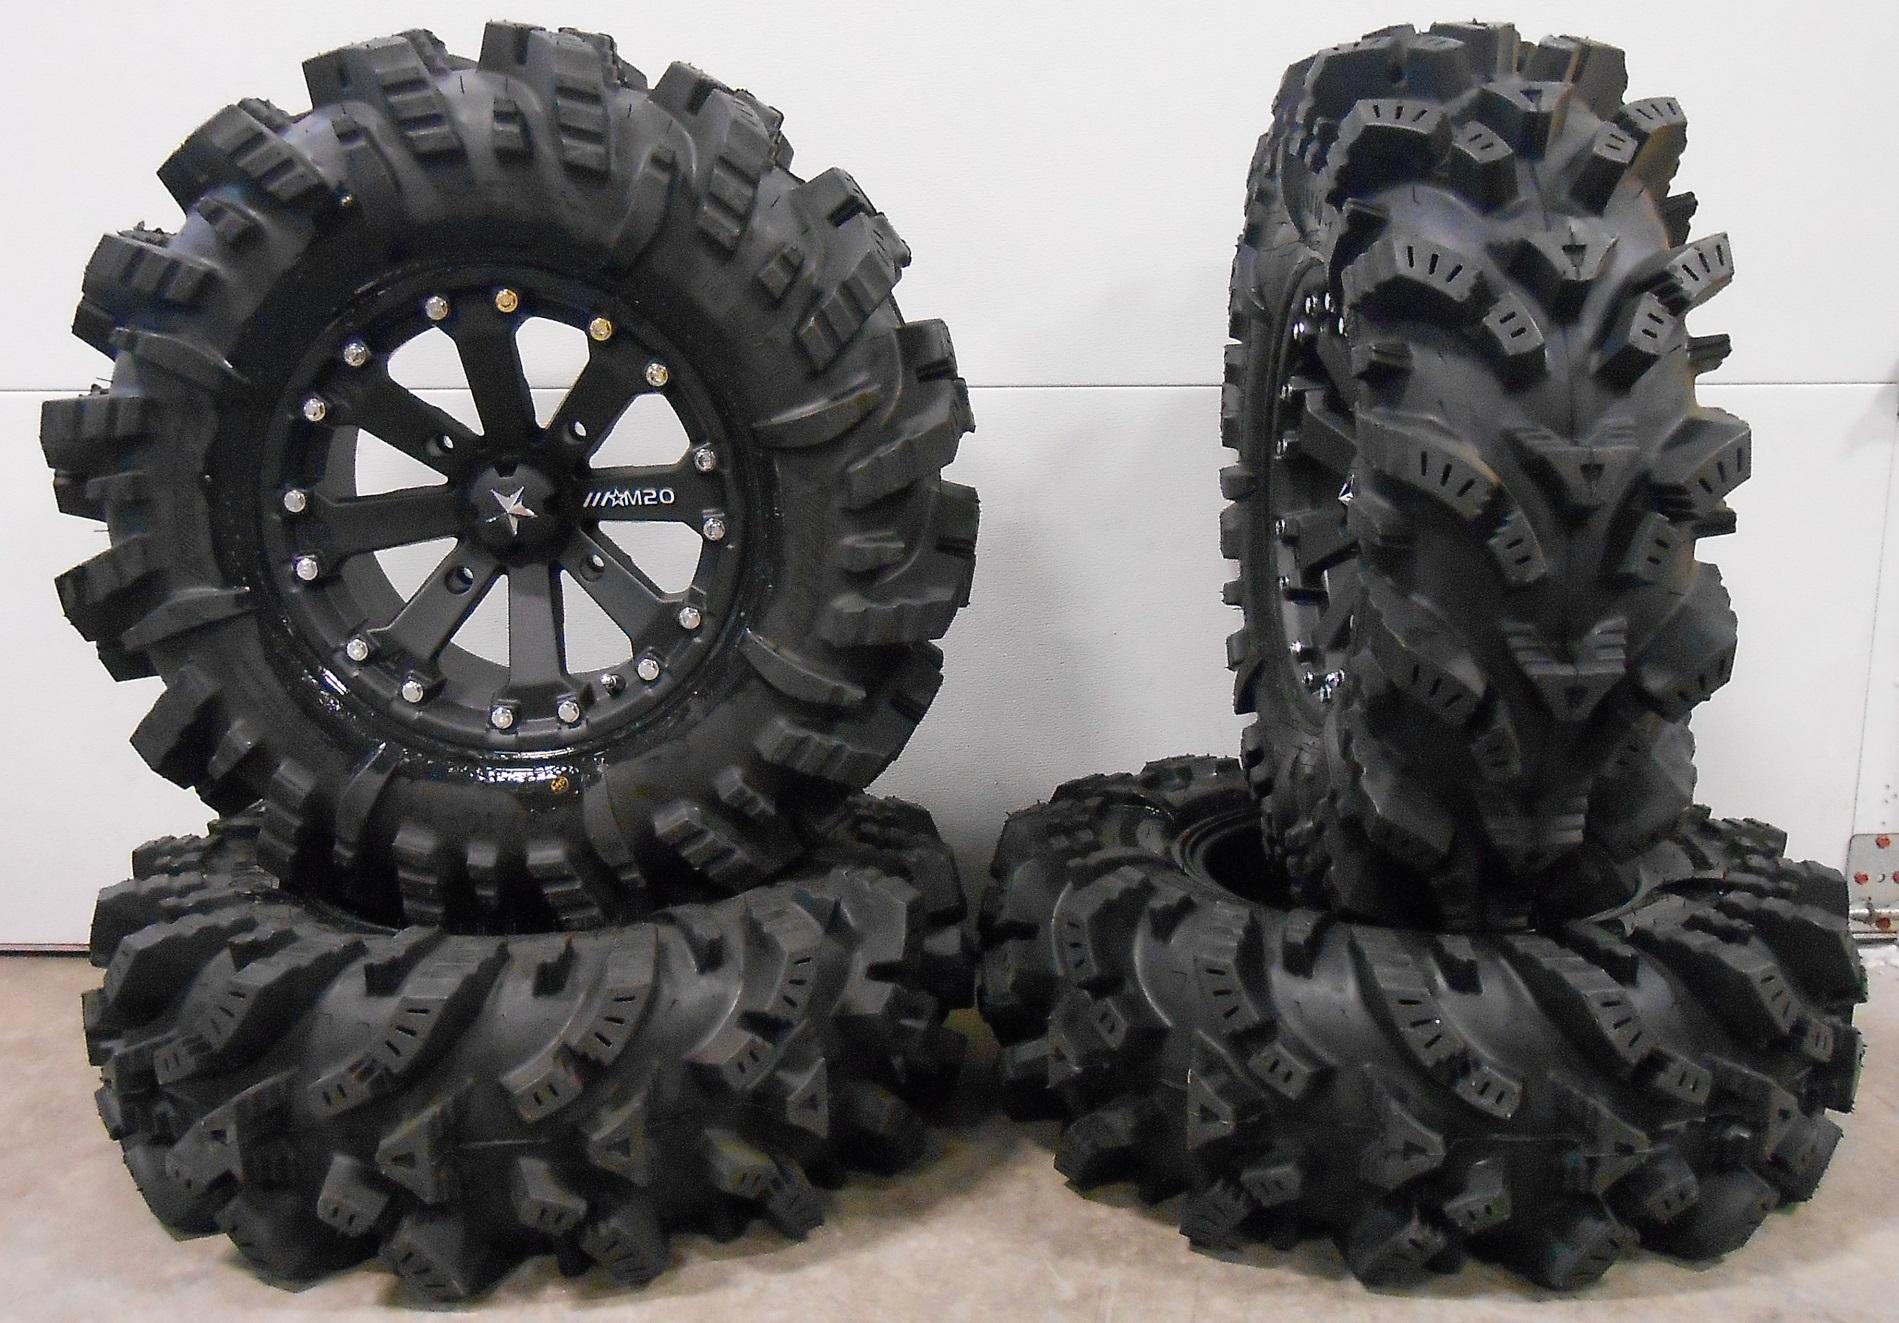 Msa Black Kore 14 Utv Wheels 30 Intimidator Tires Yamaha Viking Wolverine Ebay